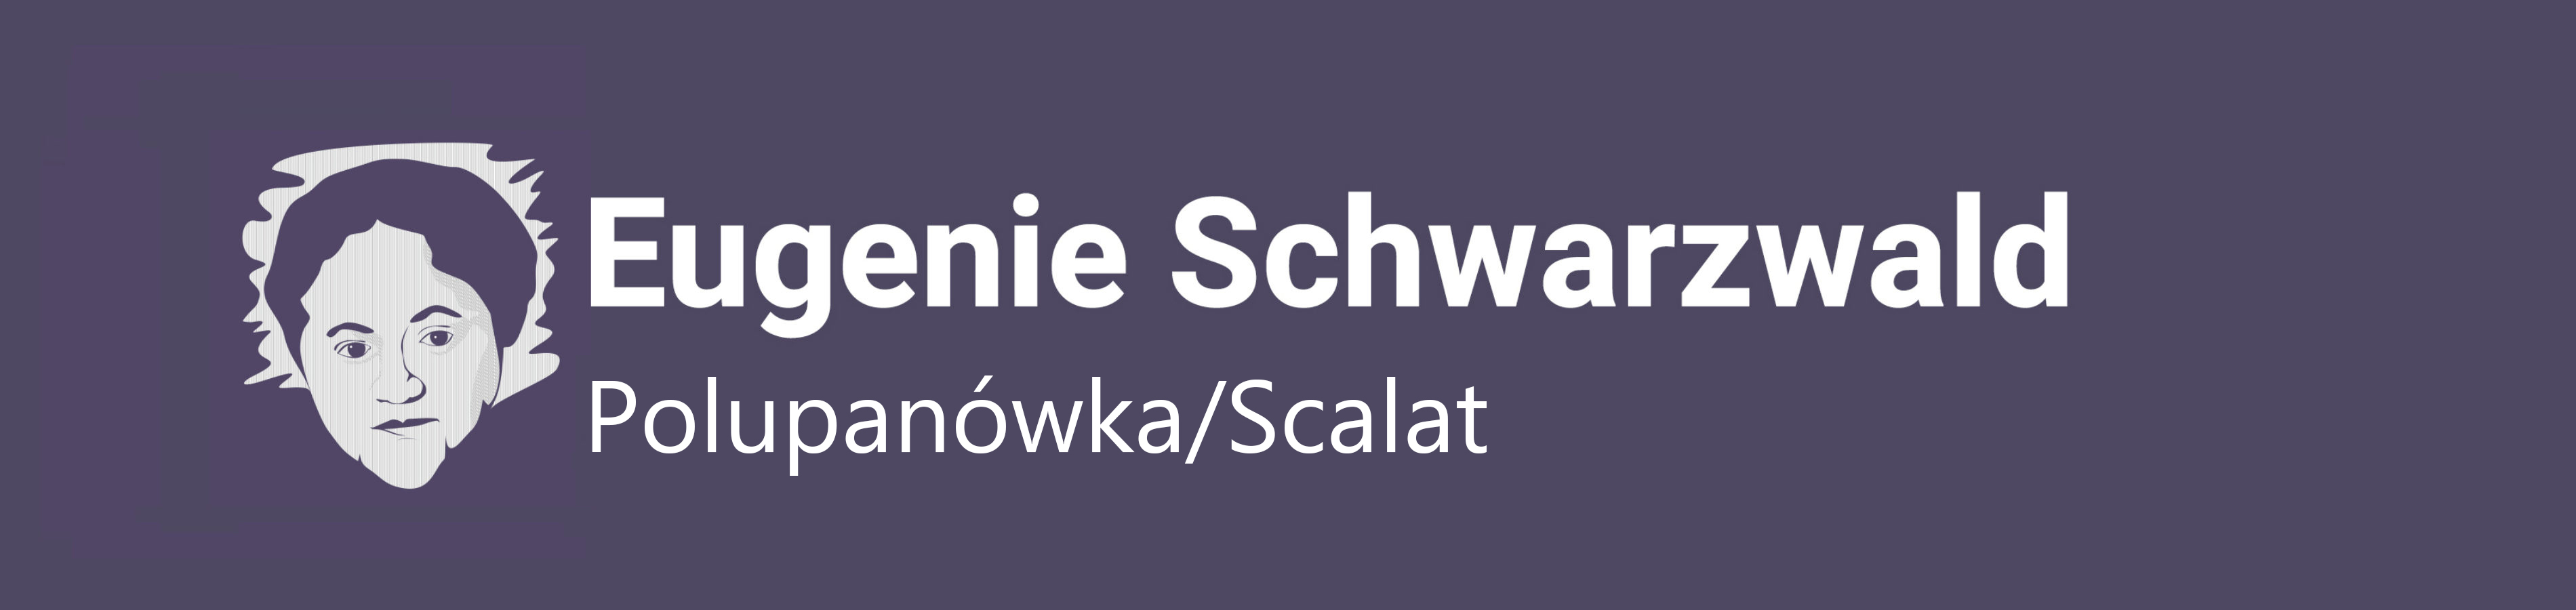 http://www.bukgalstrasse.com/wp-content/uploads/2018/06/Eugenie_Schwarzwald-333-3800x900.jpg